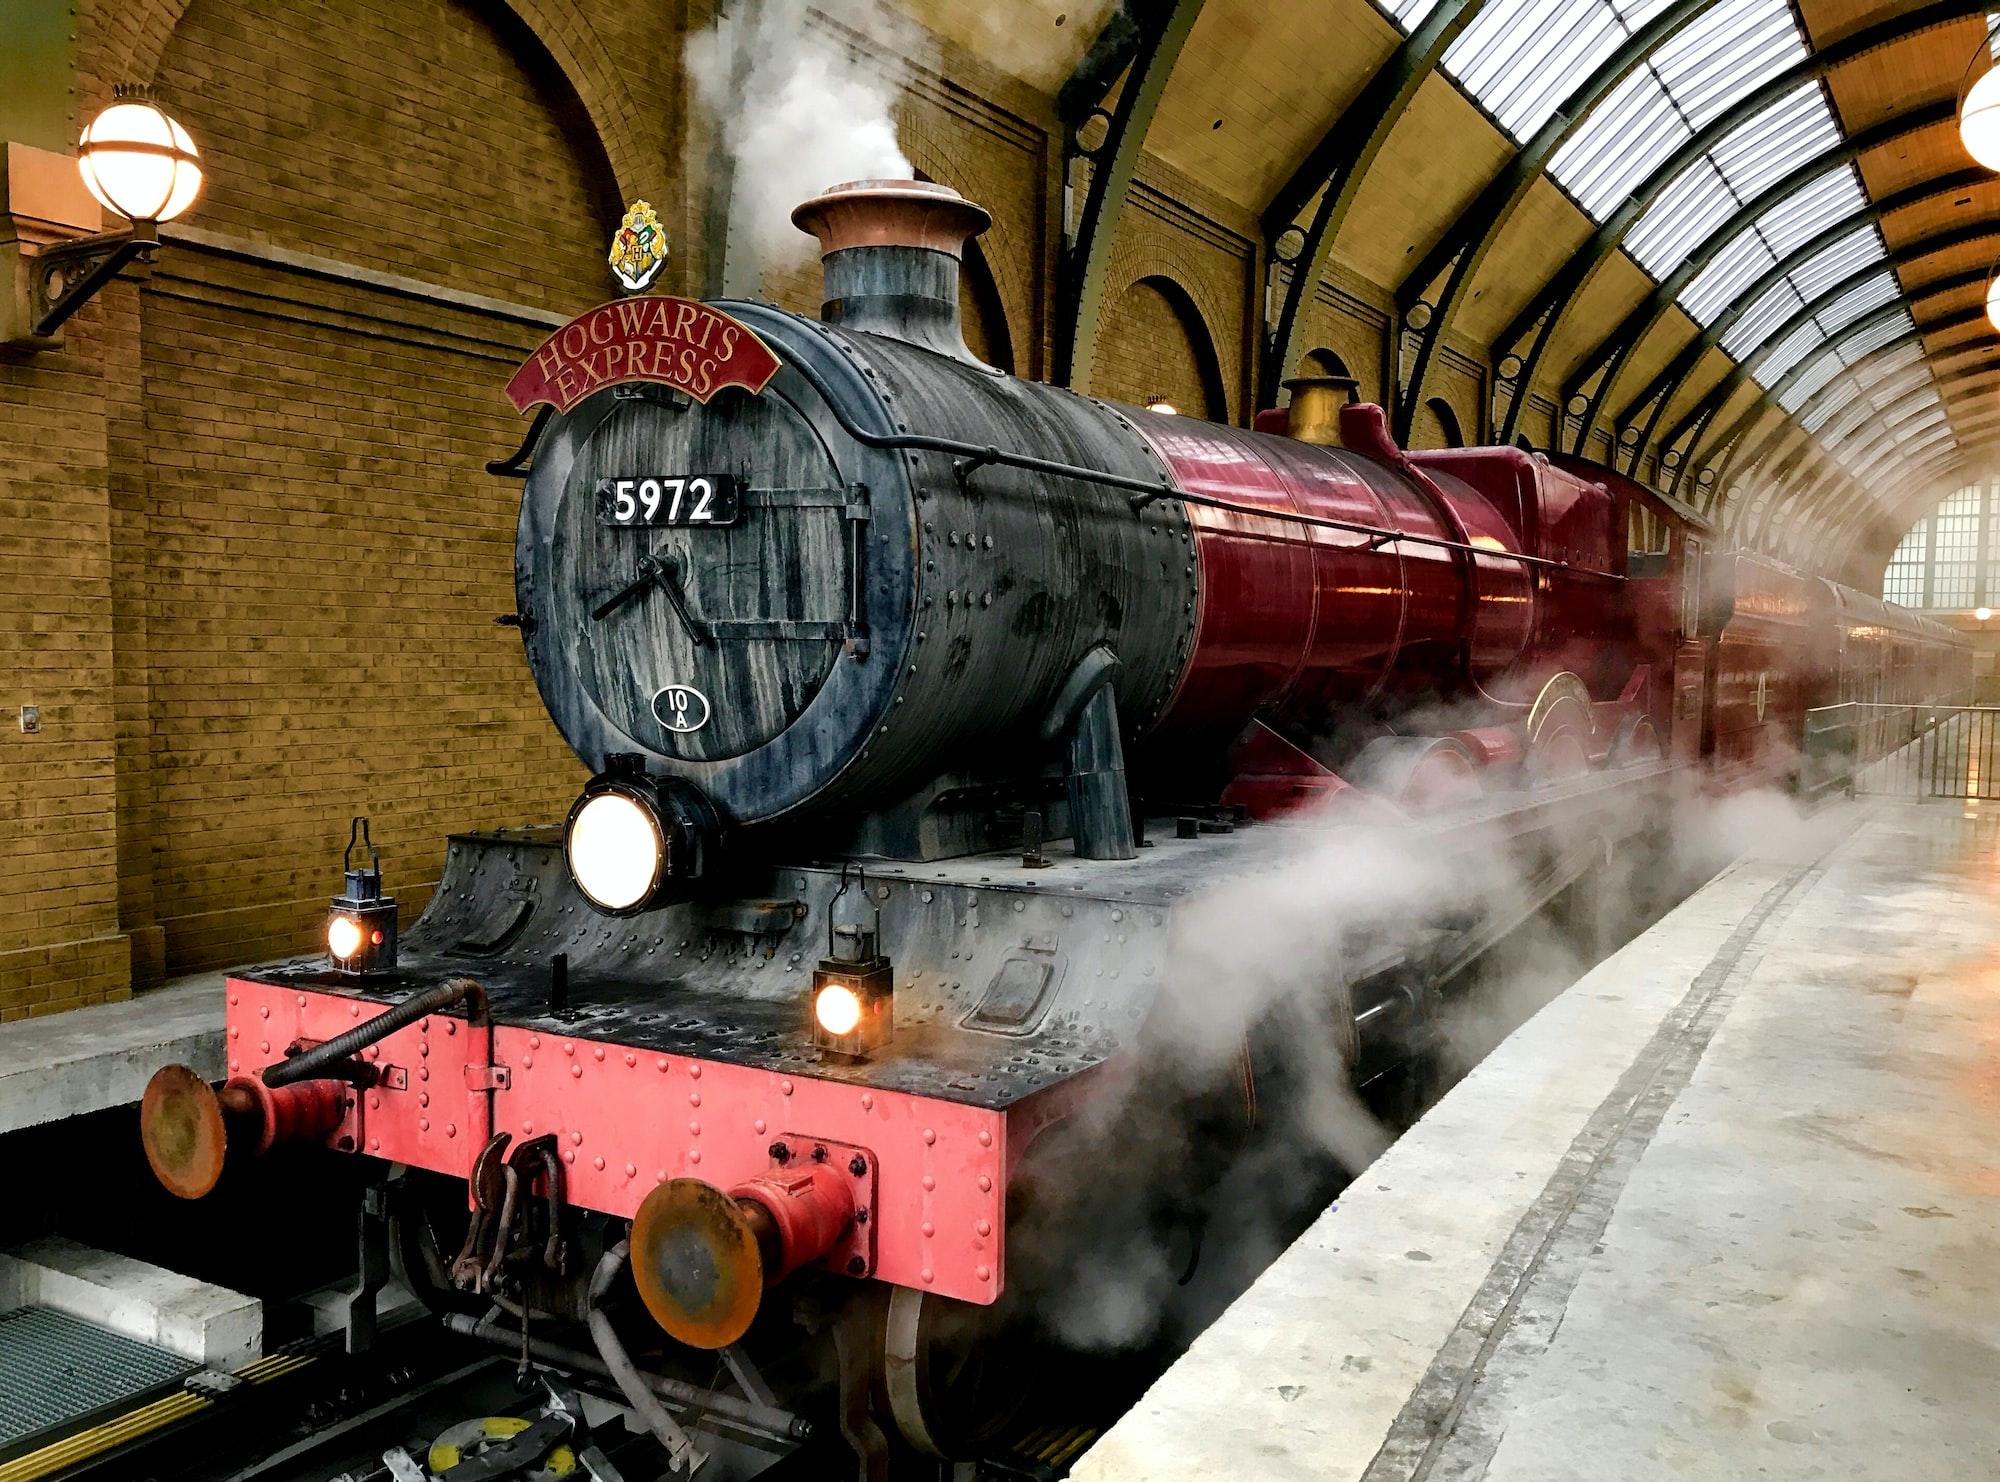 Hogwarts Express @ Universal Studios Orlando, Florida